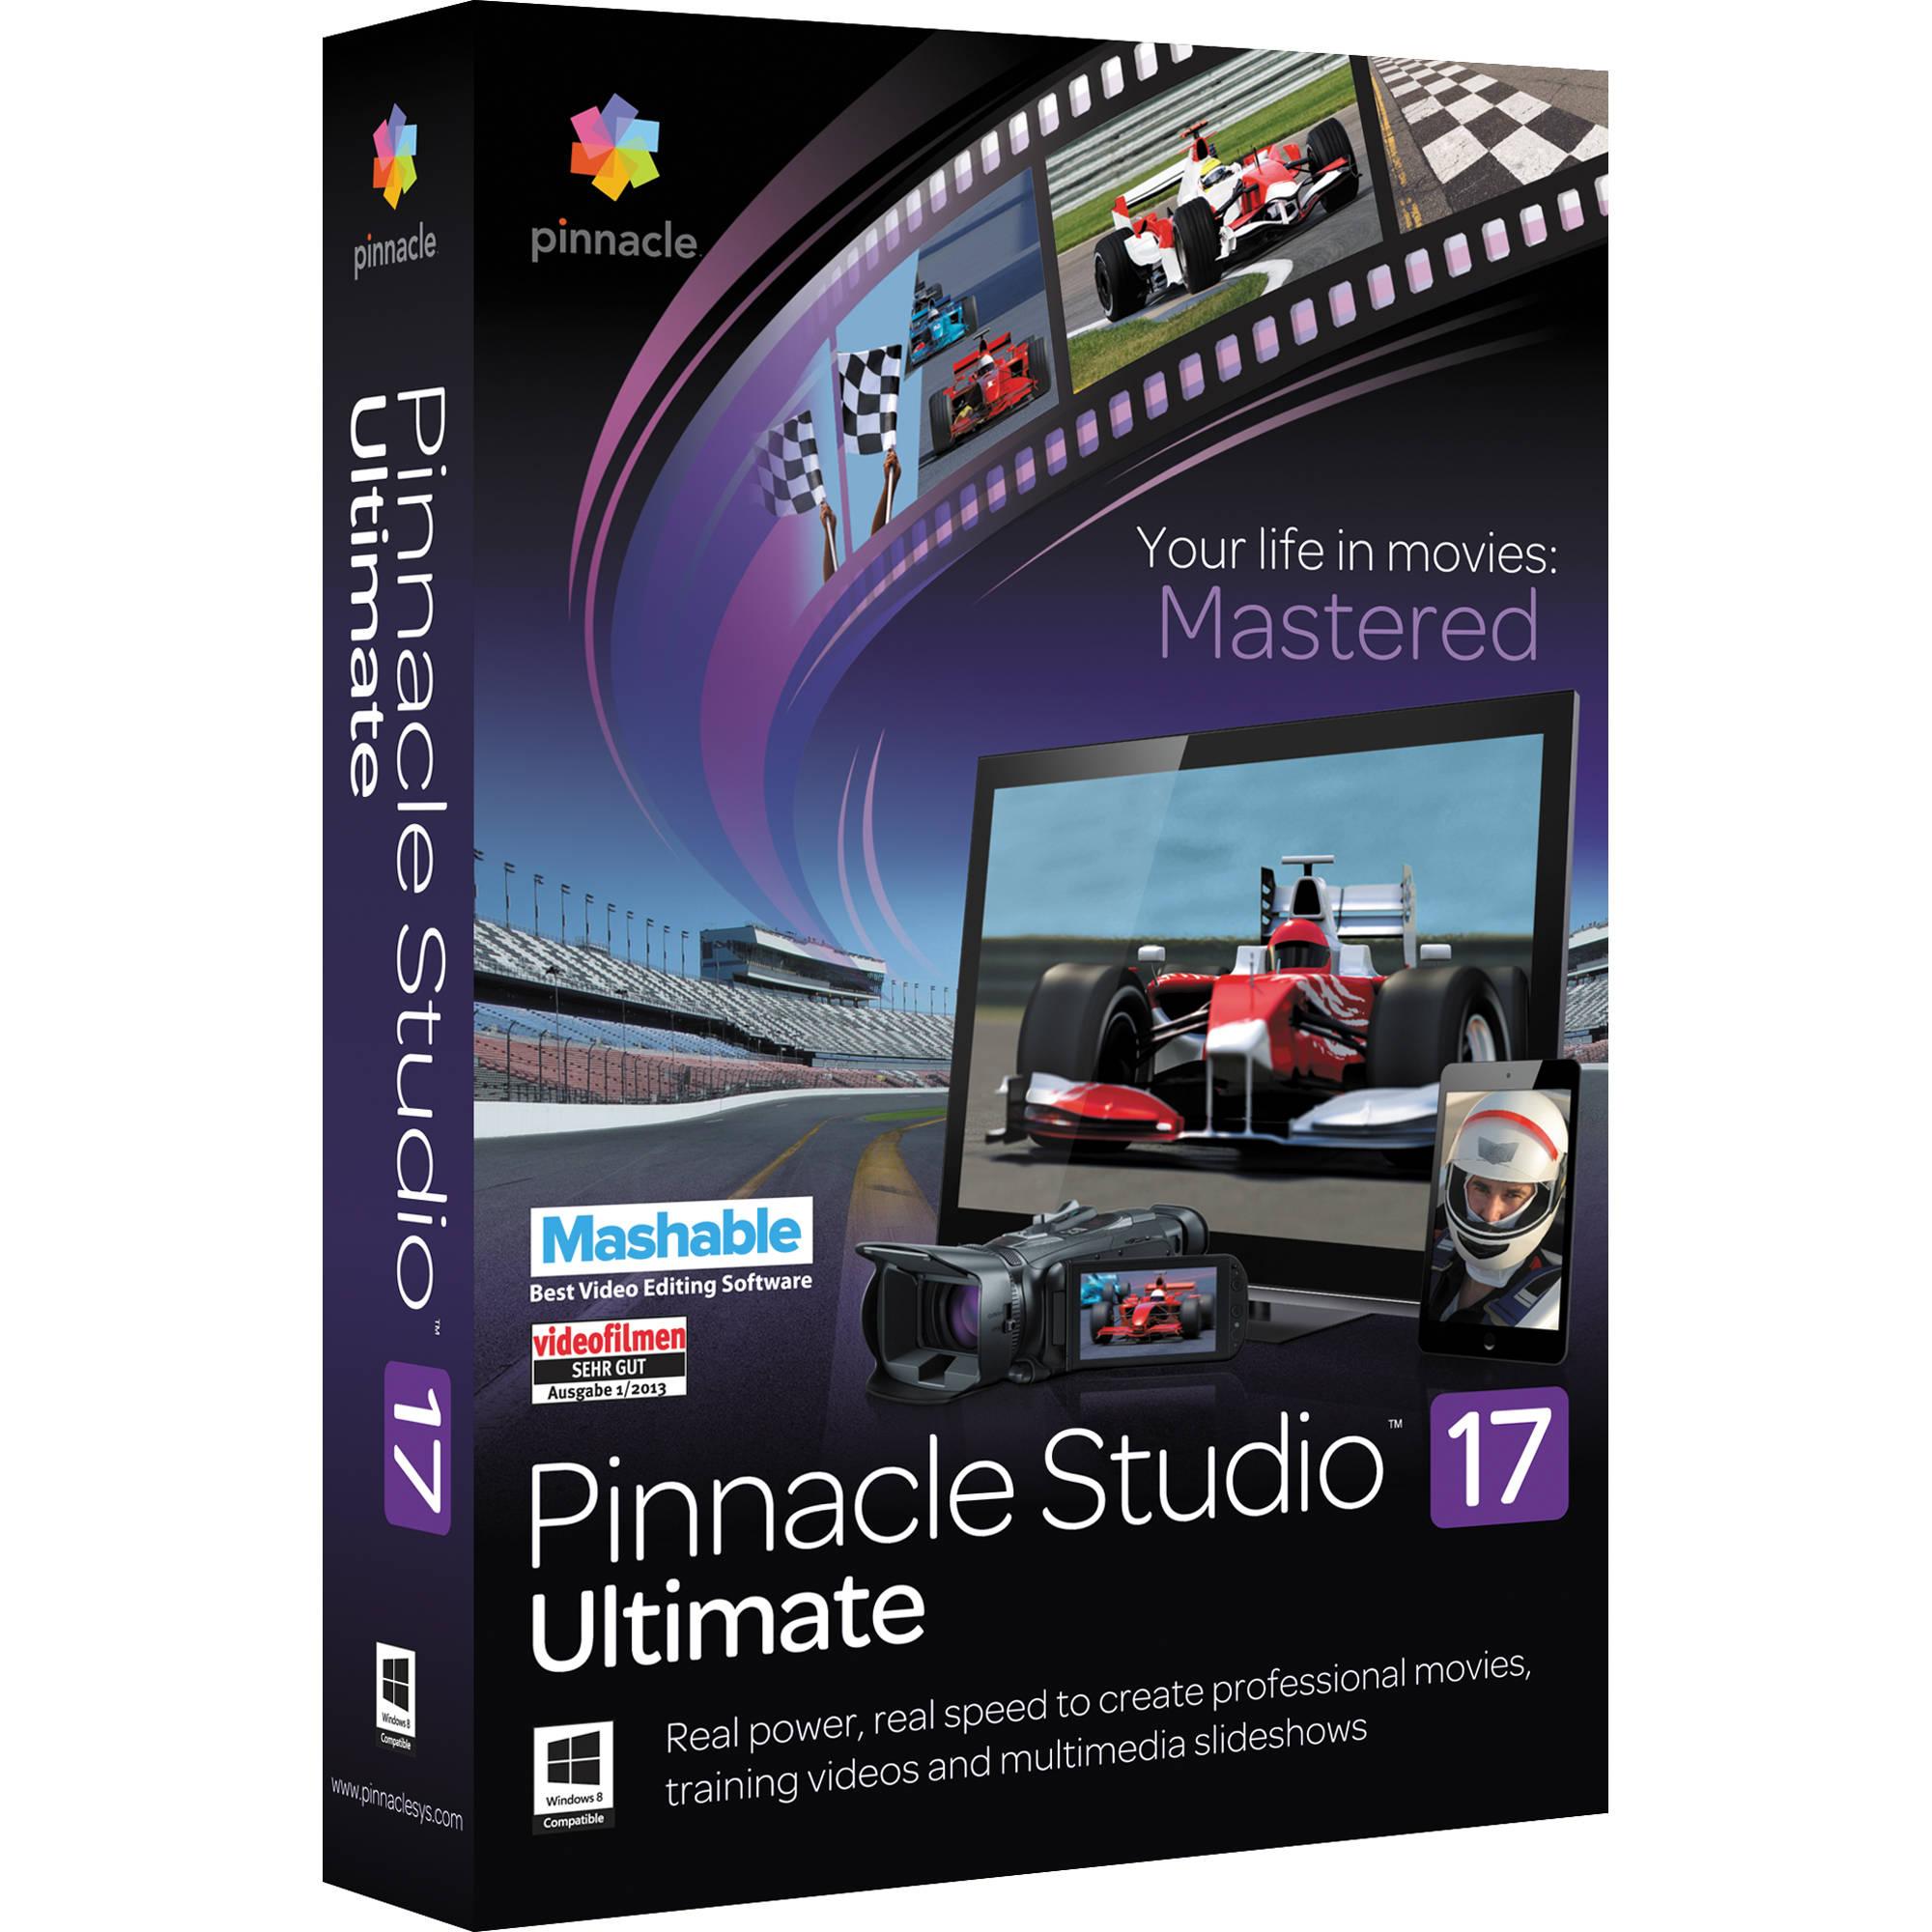 Pinnacle studio 17 ultimate boxed version pnst17ulenam bh pinnacle studio 17 ultimate boxed version maxwellsz